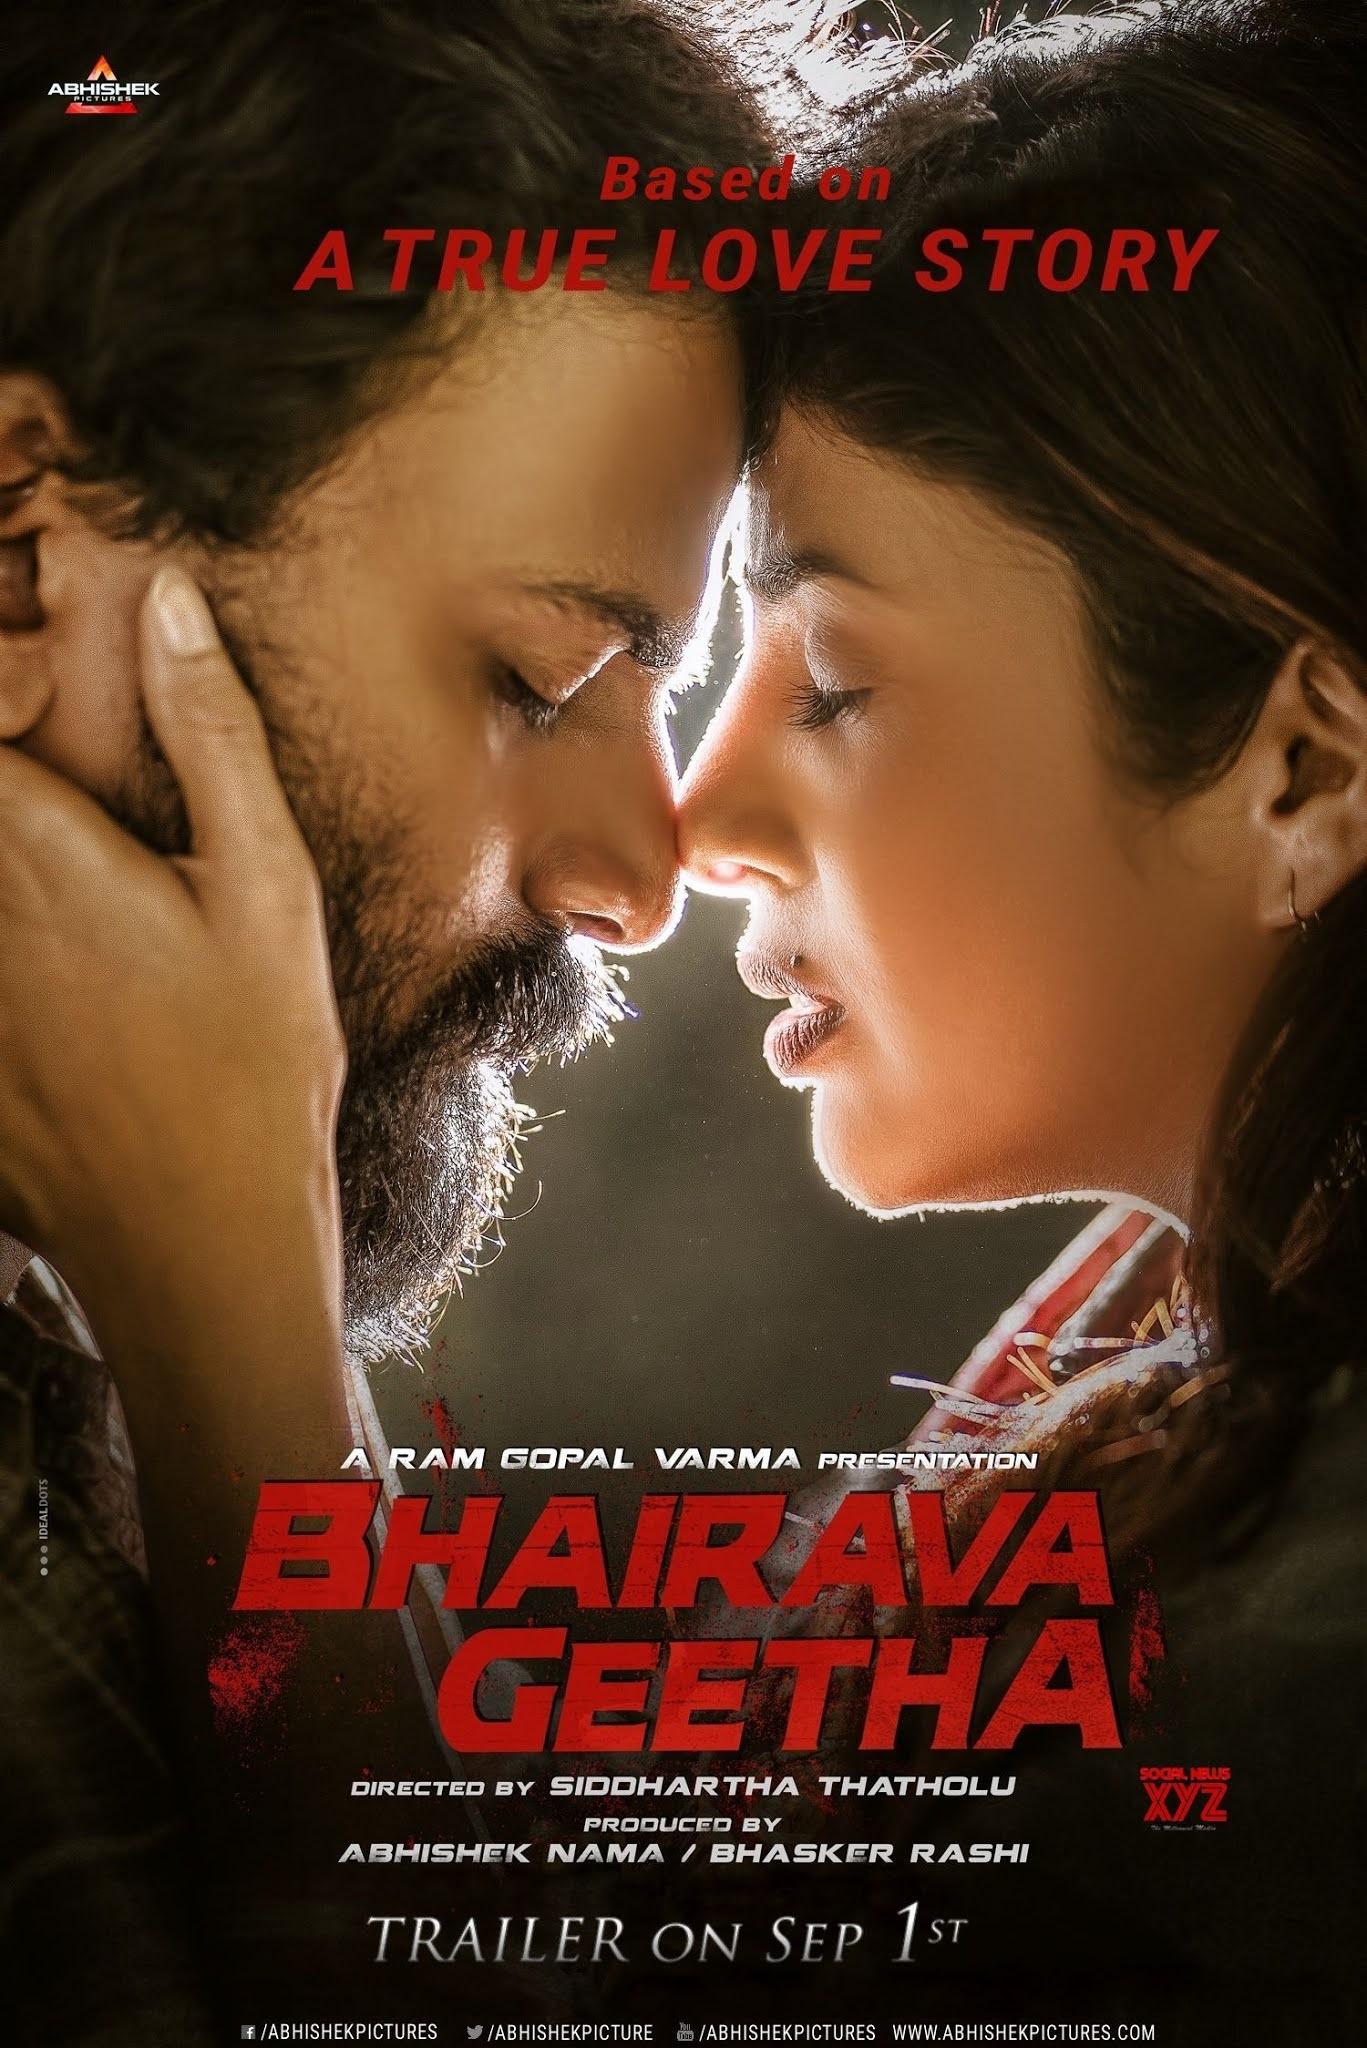 Bhairava Geetha 2020 Hindi Dubbed 300MB HDRip 480p Free Download